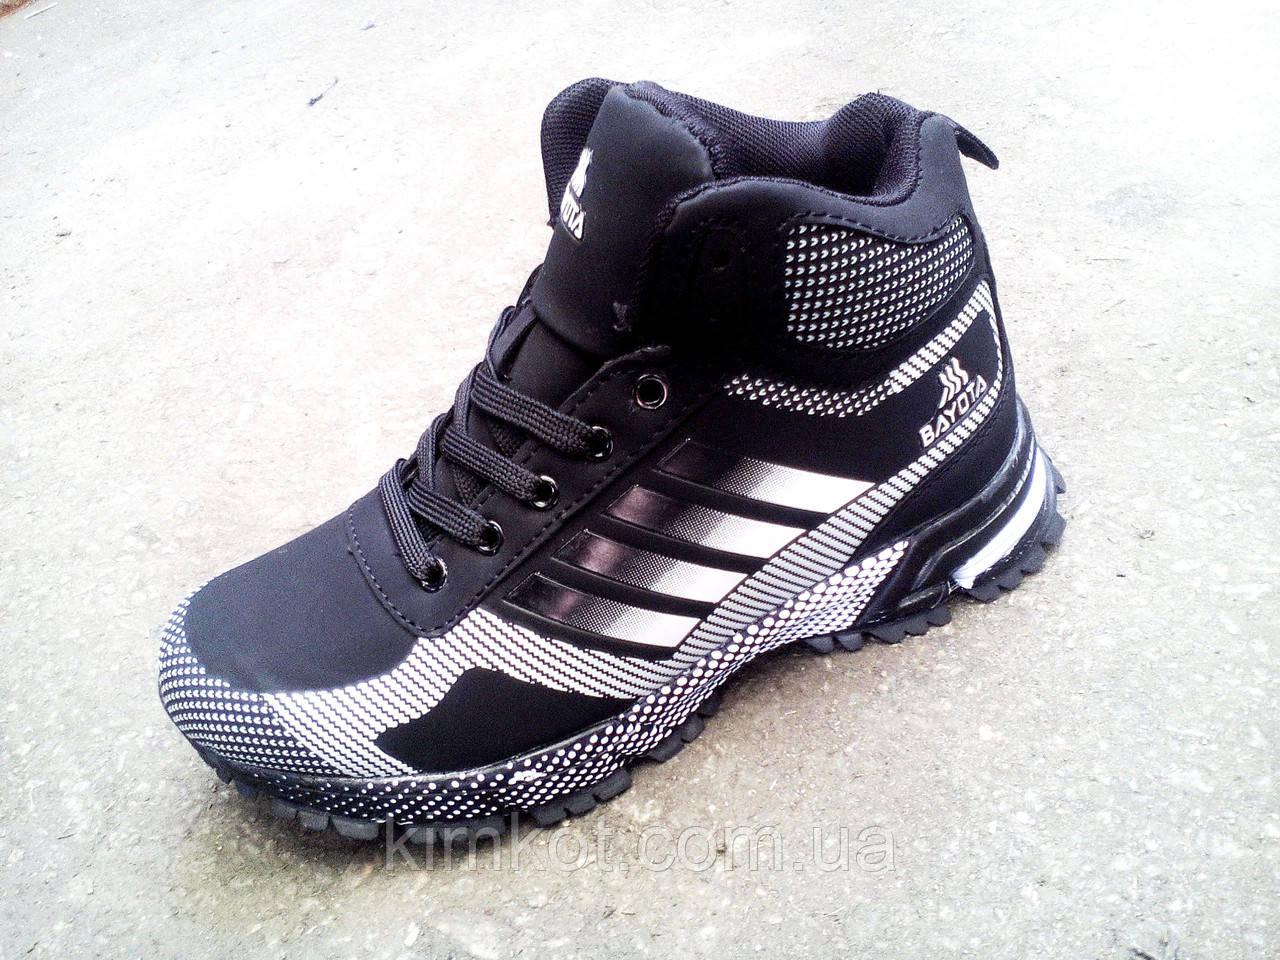 Подростковые спортивные зимние ботинки 36 -41 р-р  продажа, цена в ... 9e9e825111e